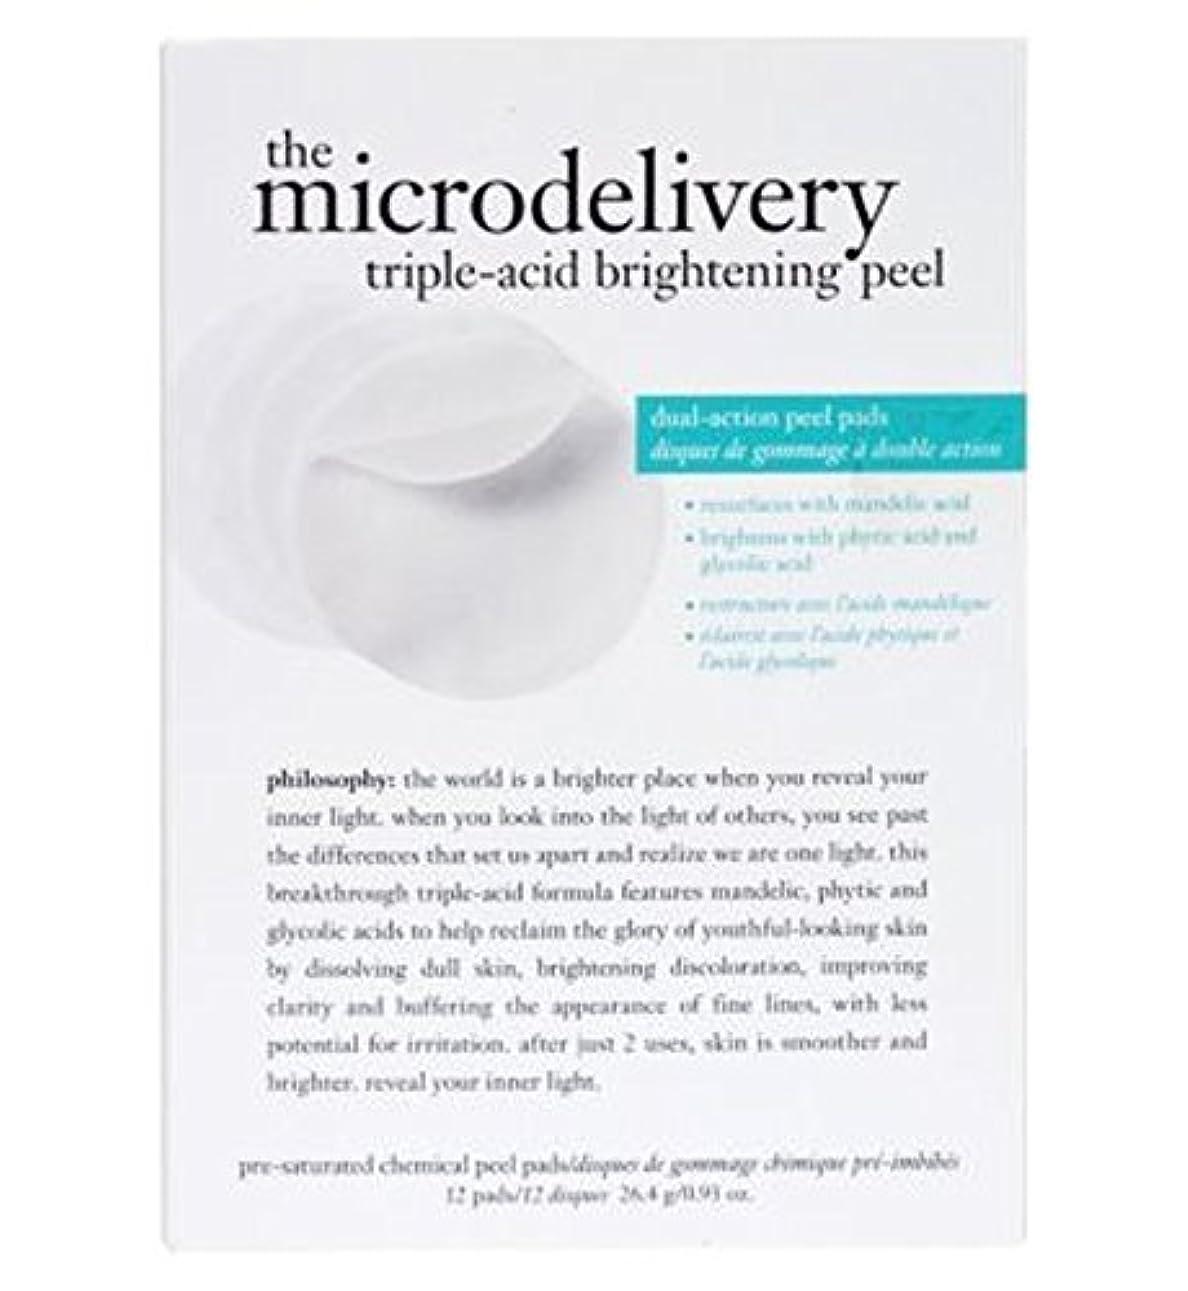 philosophy the microdelivery triple-acid brightening peel - 哲学ミクロ送達トリプル酸増白皮 (Philosophy) [並行輸入品]